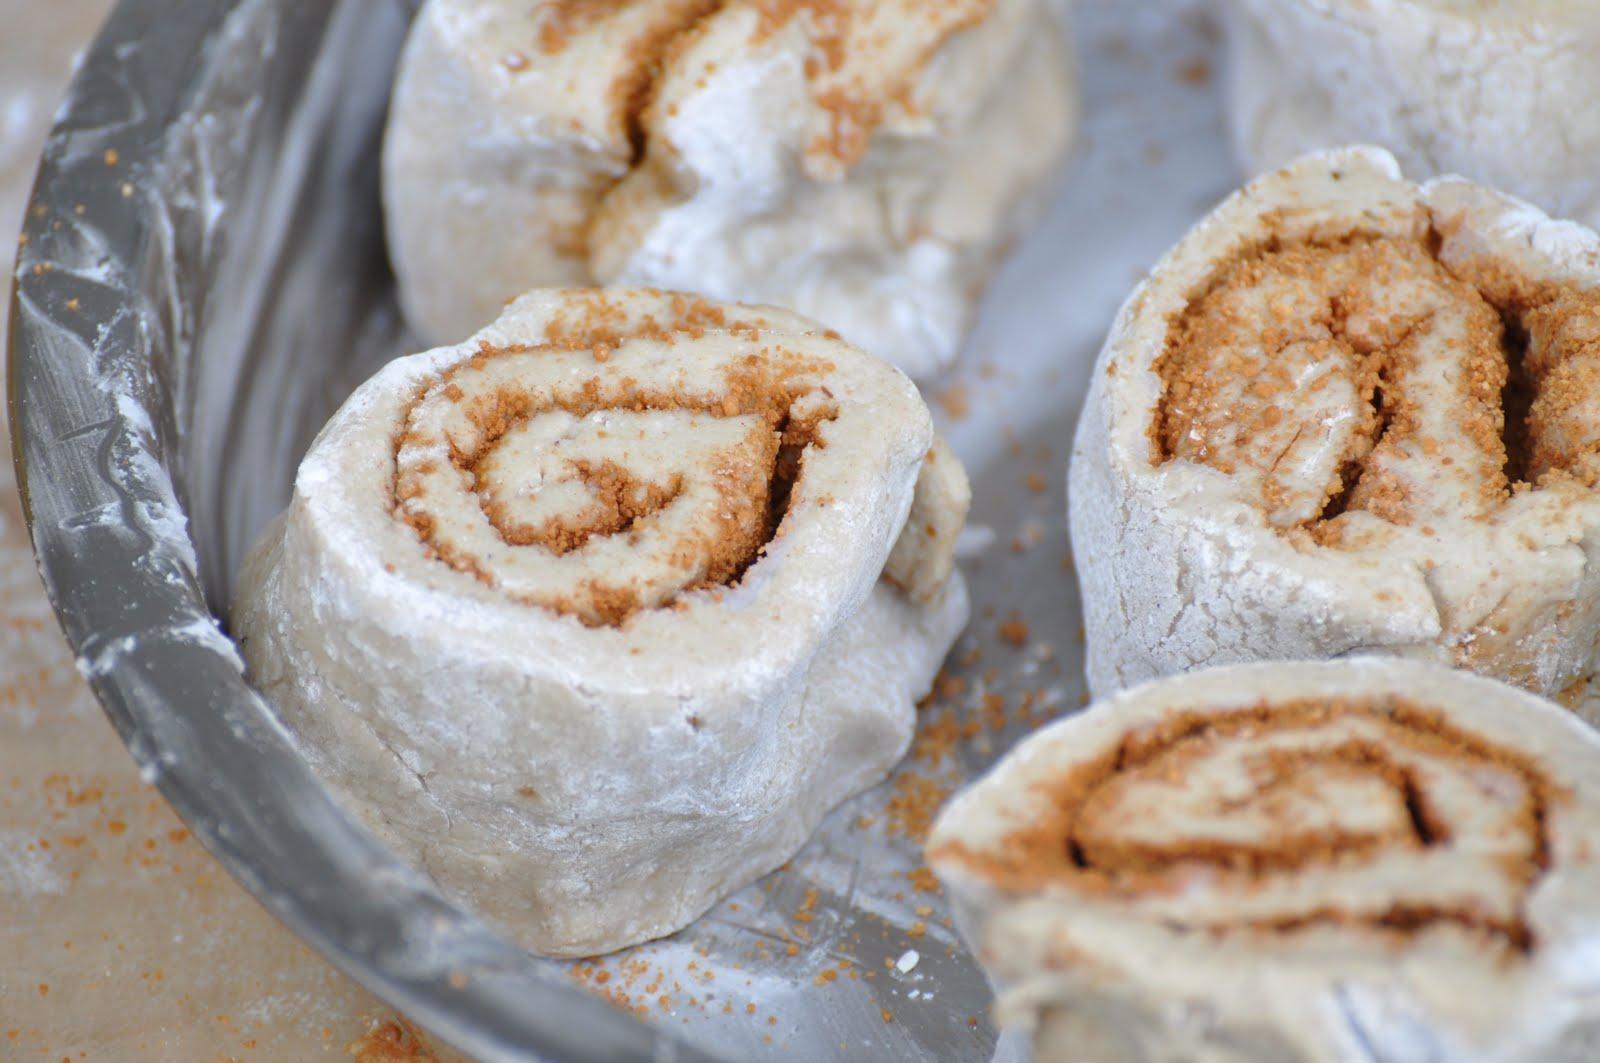 ... Meals: Buckwheat Cinnamon Rolls (Gluten-free, Vegan, Yeast-Free